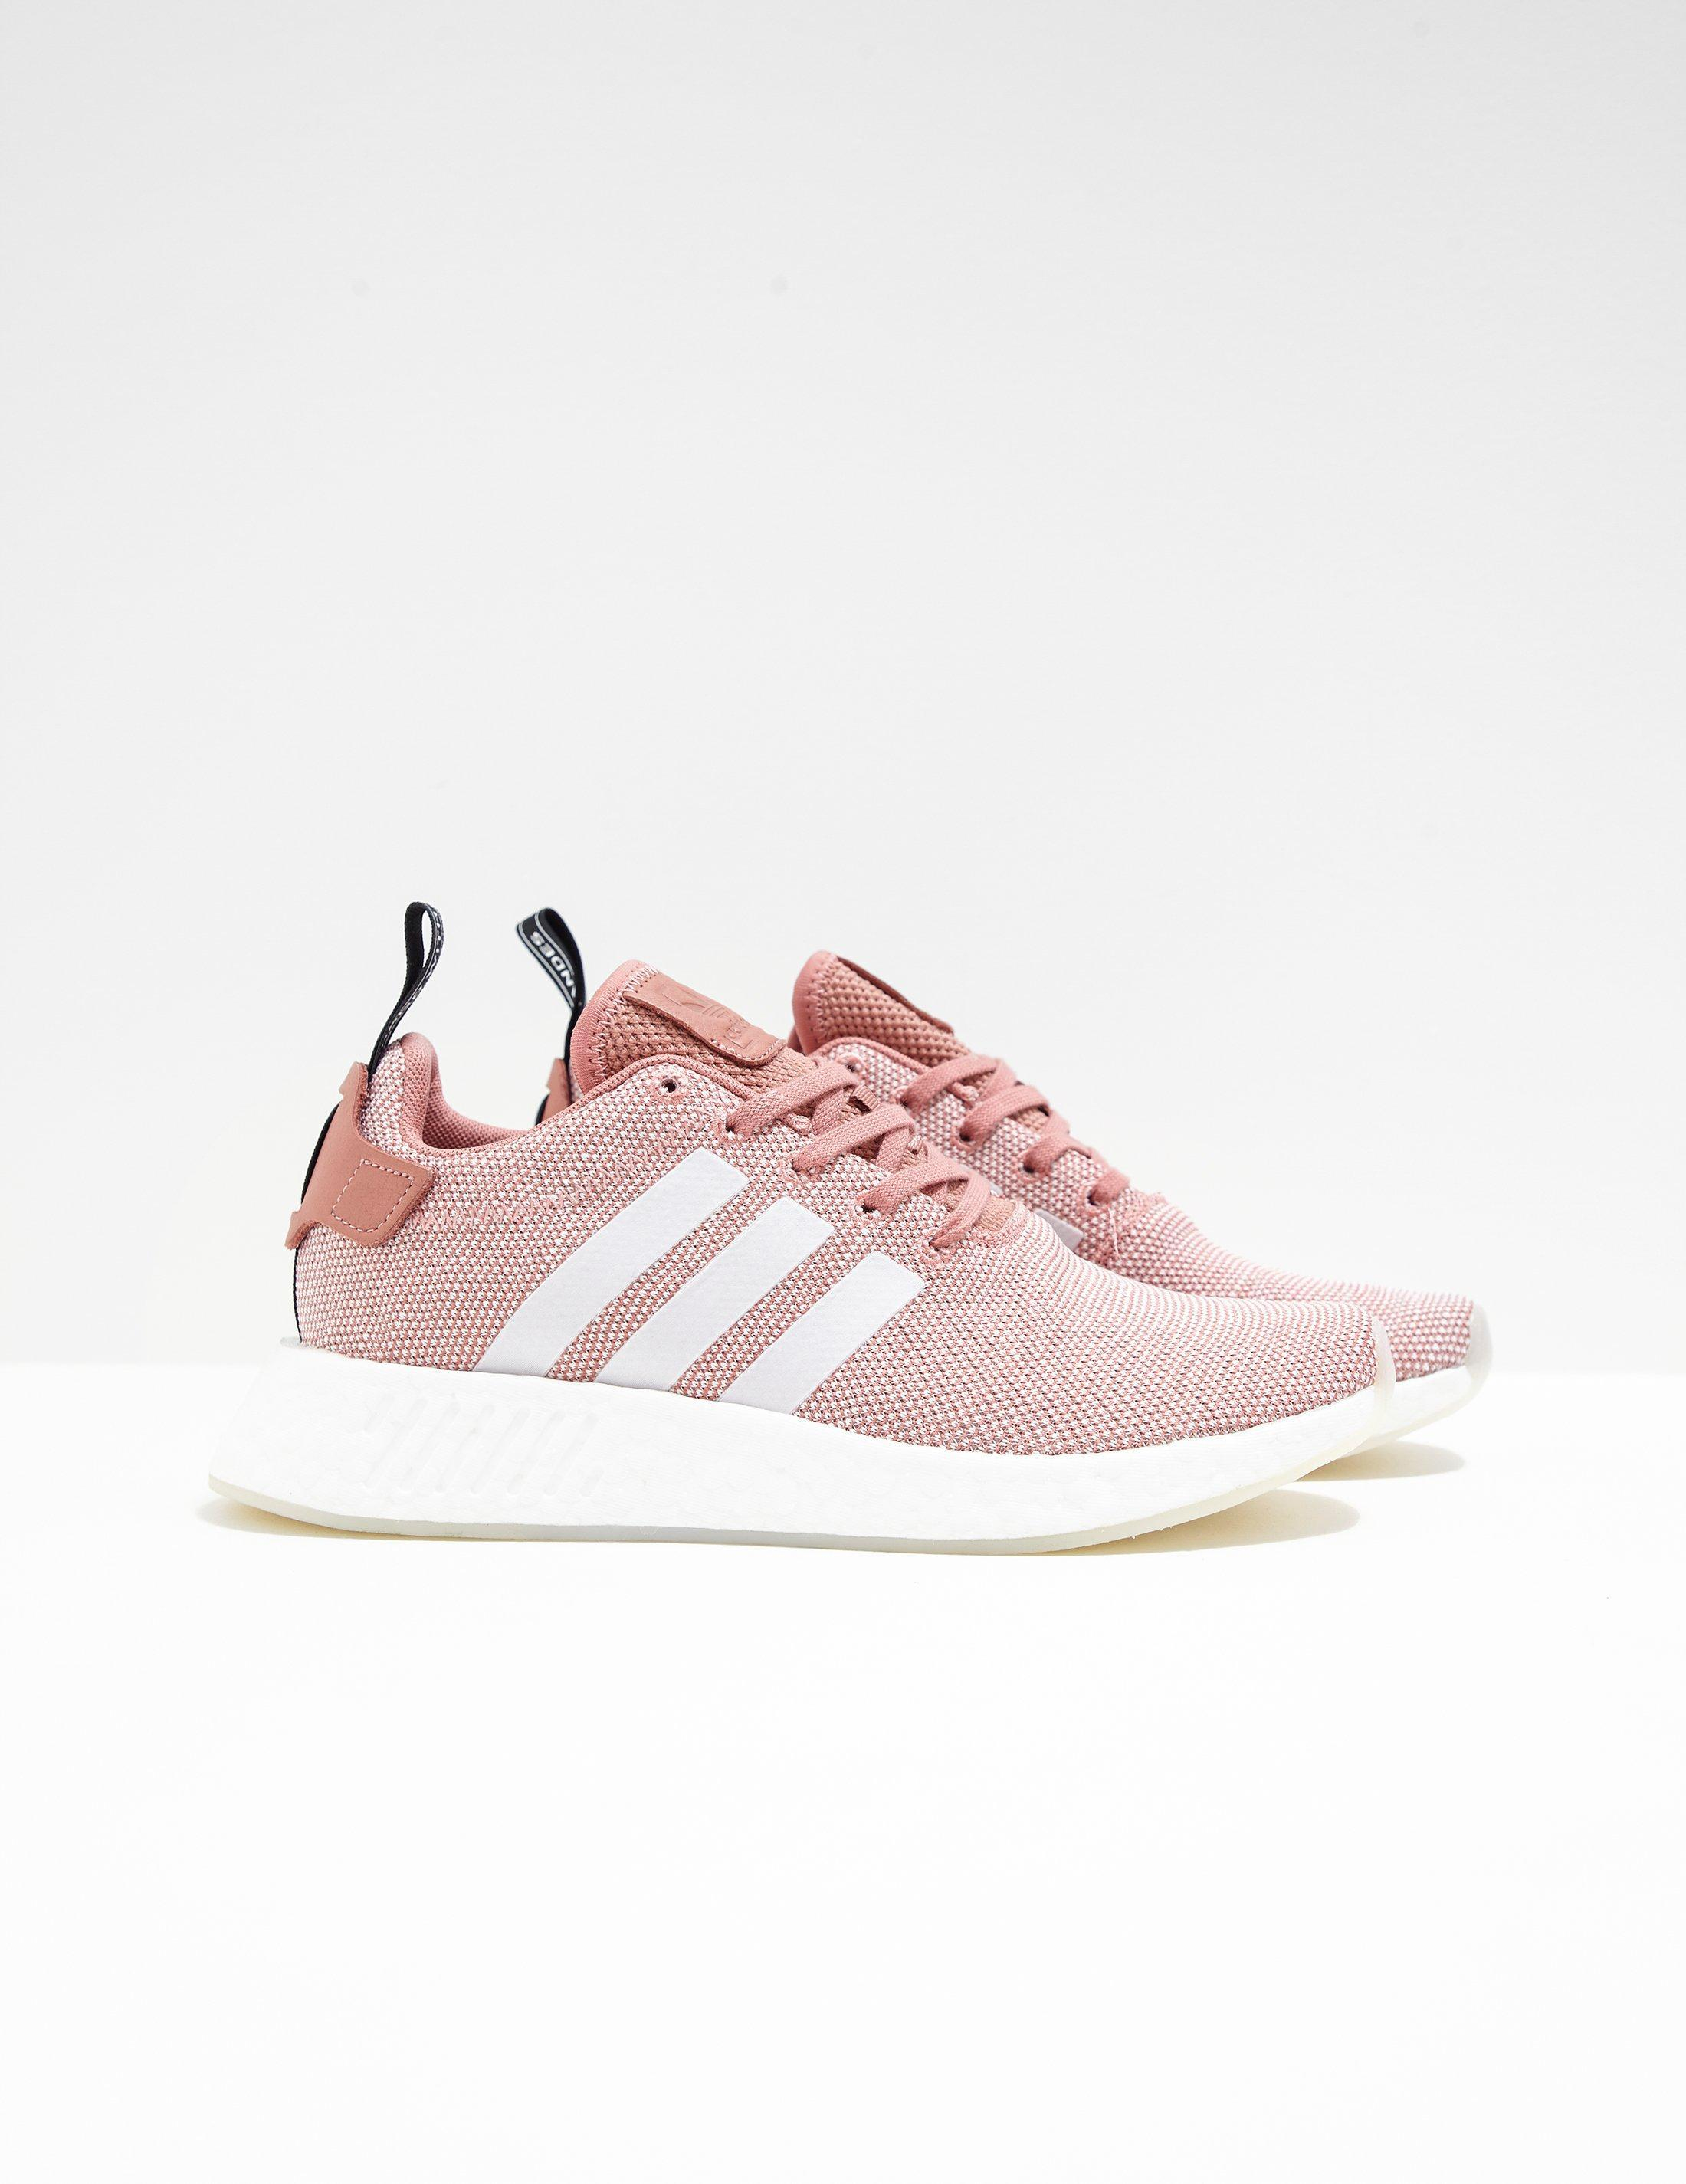 88d3debf524e5 adidas Originals Womens Nmd R2 Women s Pink in Pink - Lyst